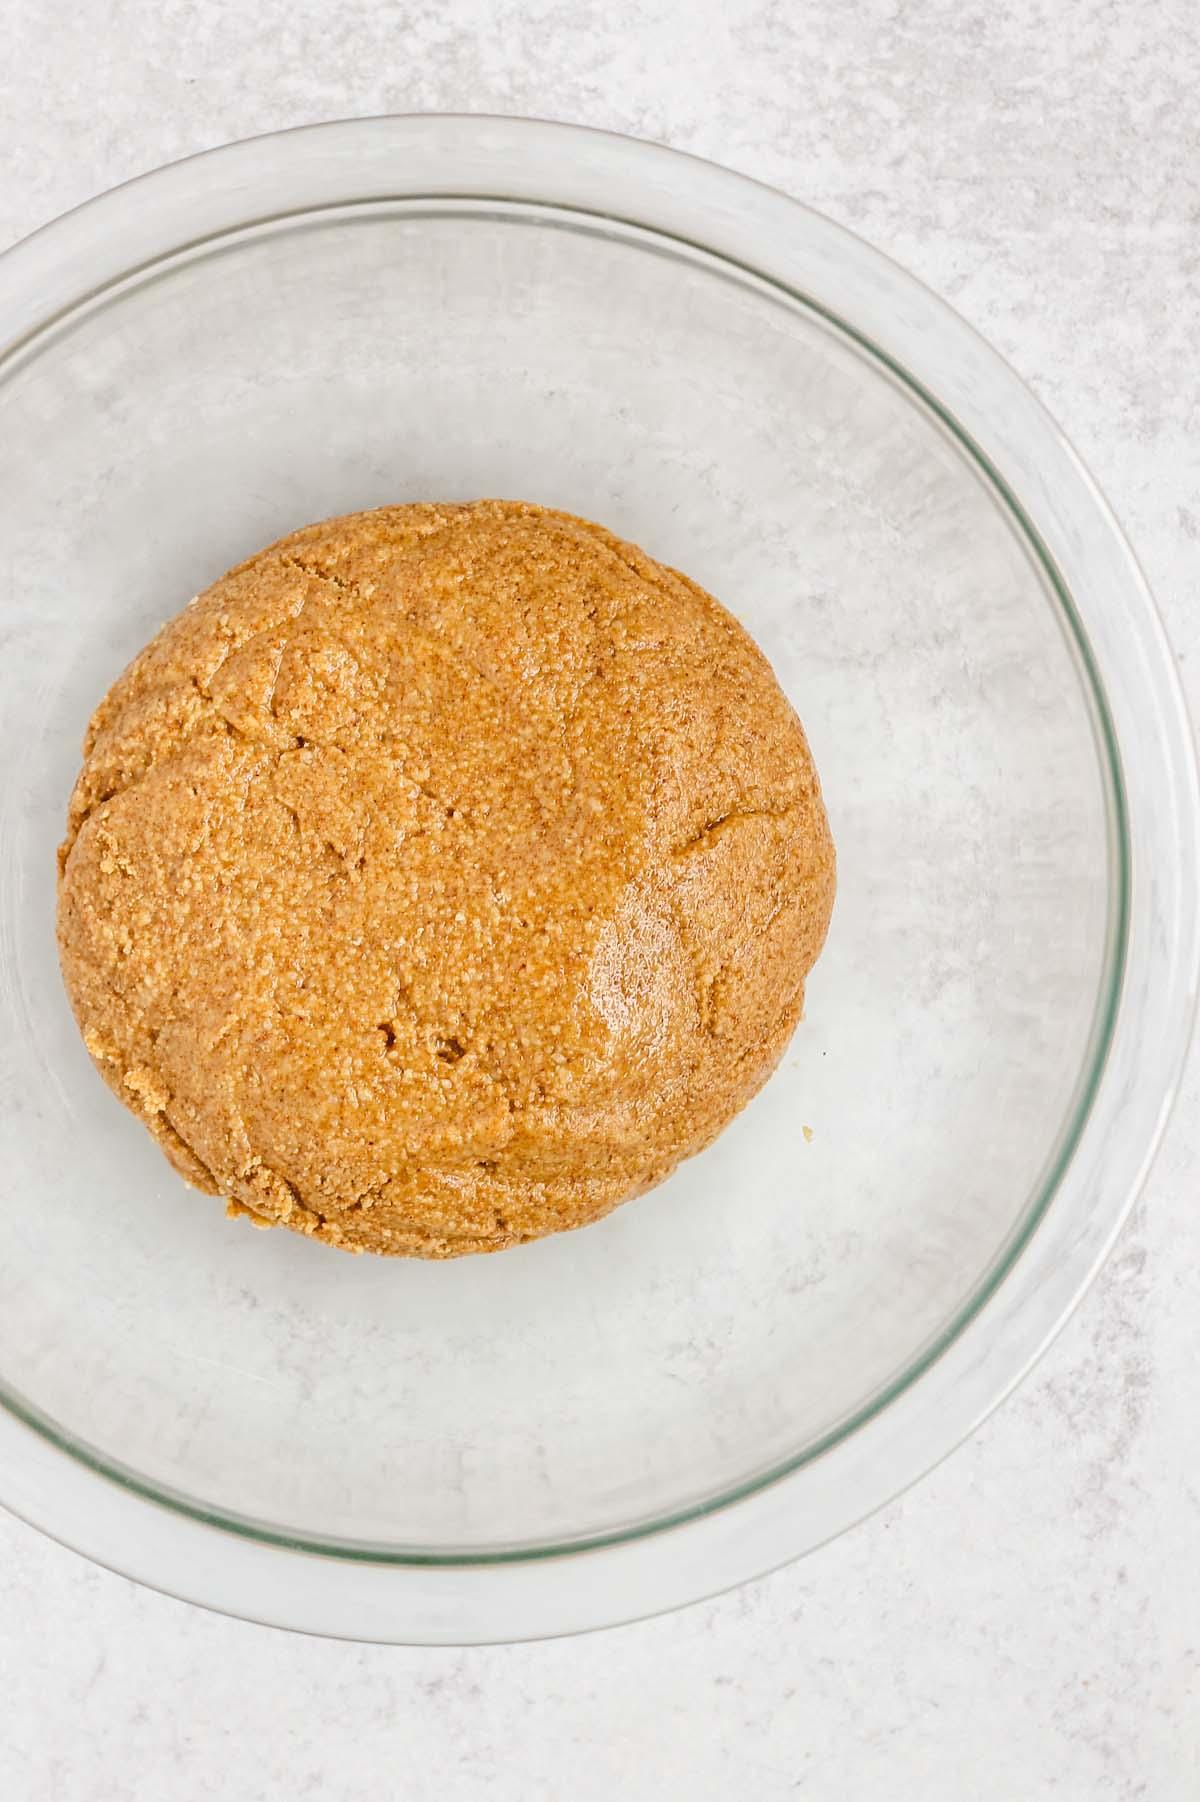 mixed peanut butter dough in a glass bowl